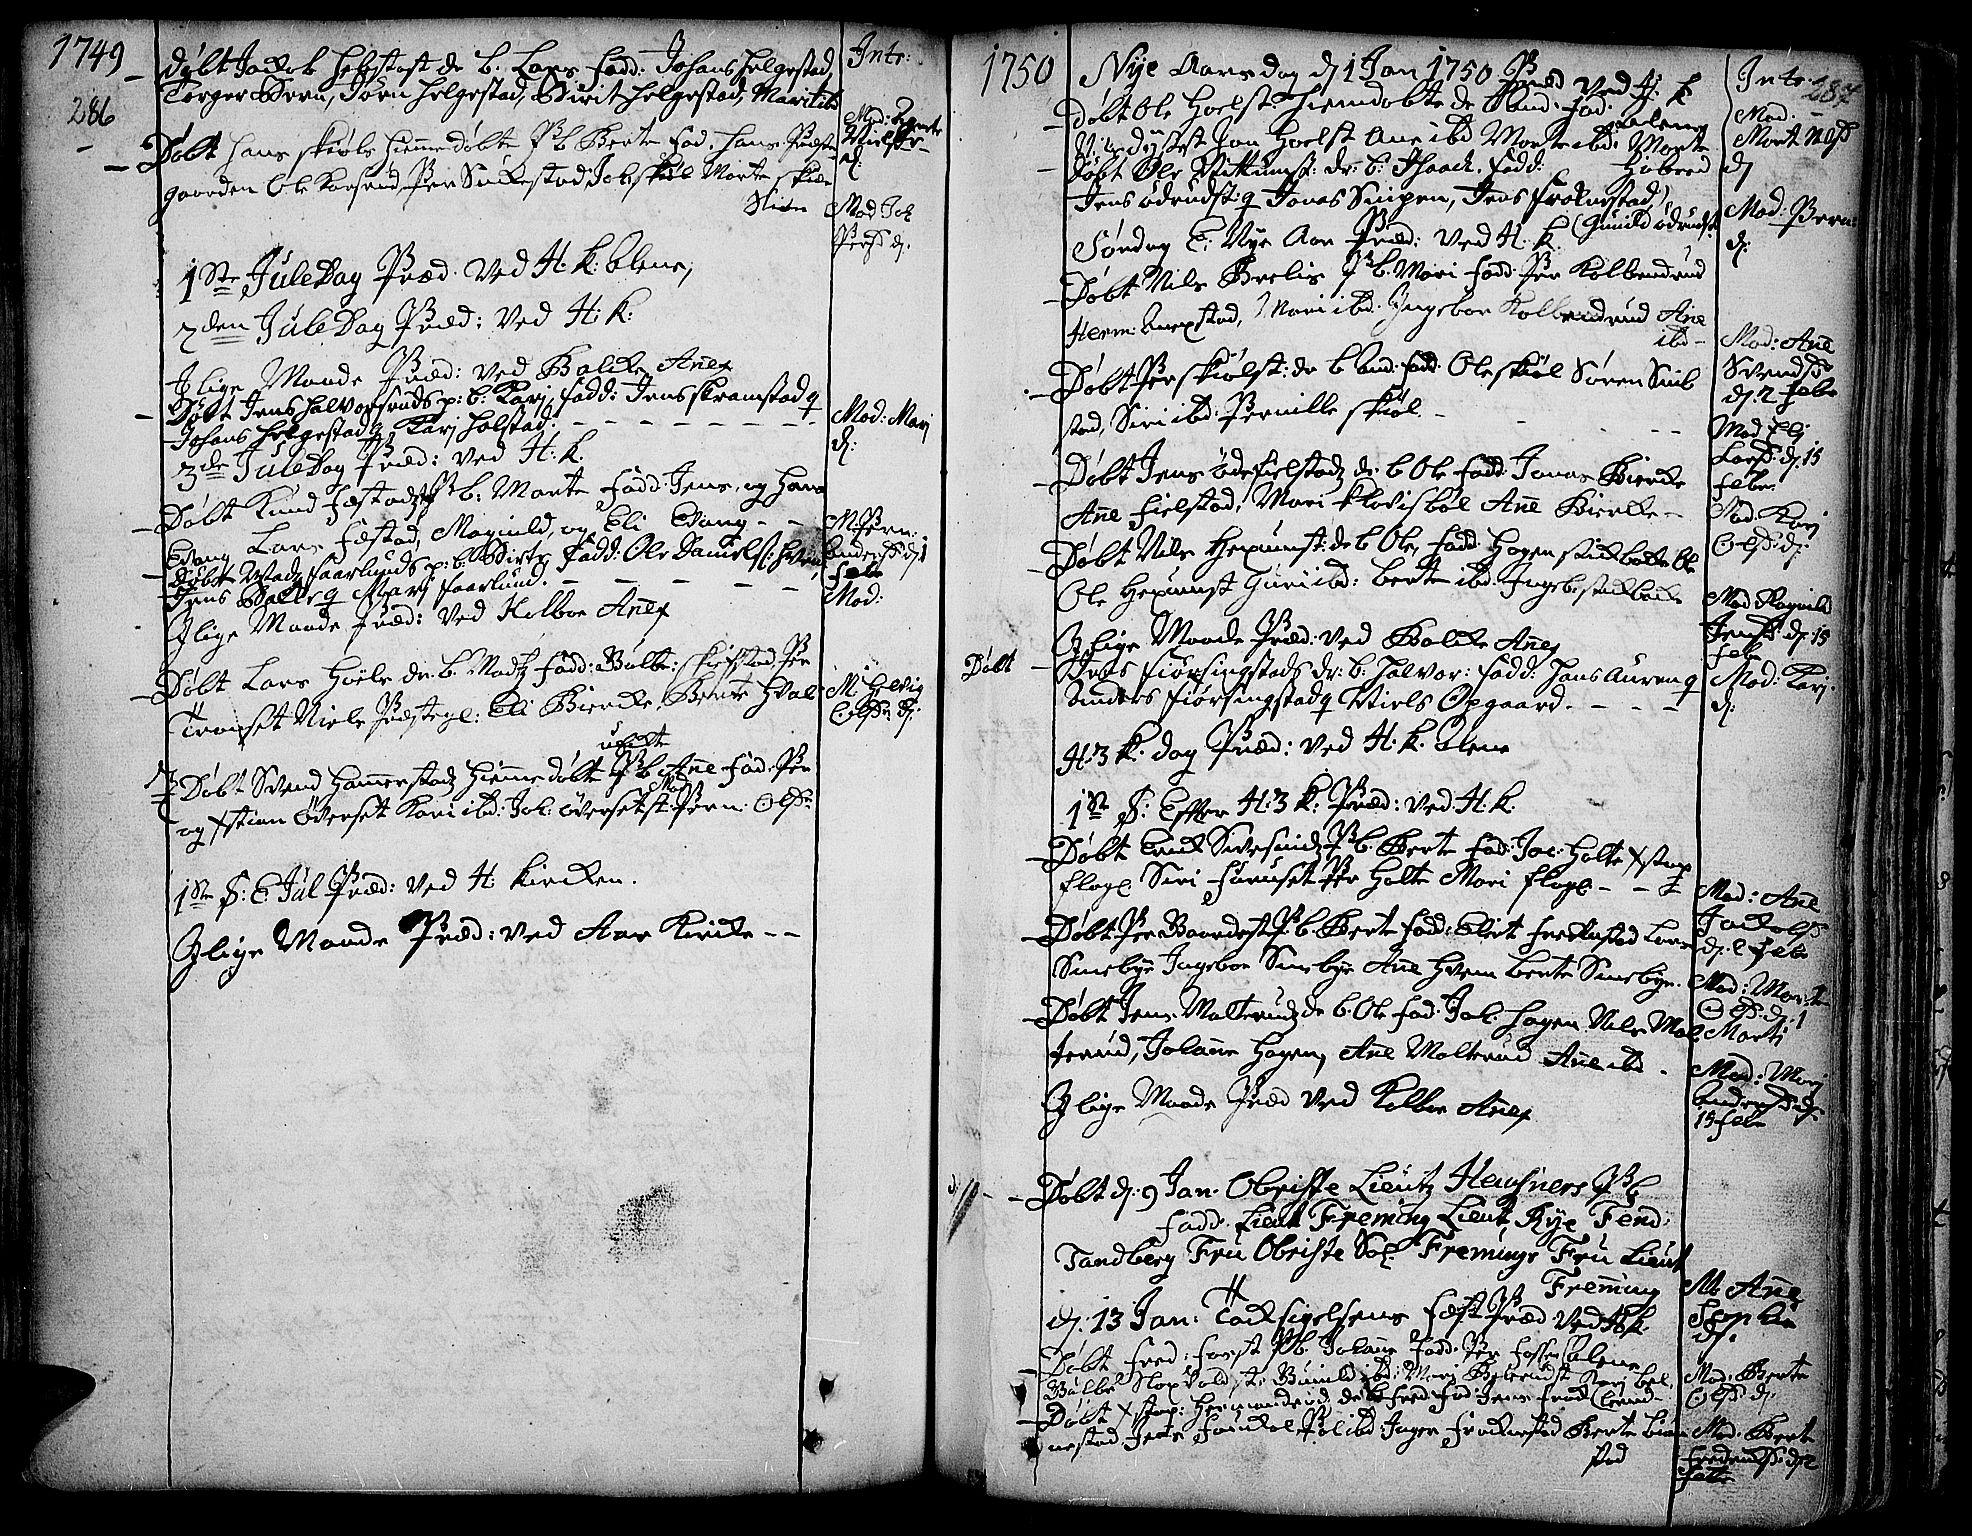 SAH, Toten prestekontor, Ministerialbok nr. 3, 1734-1751, s. 286-287